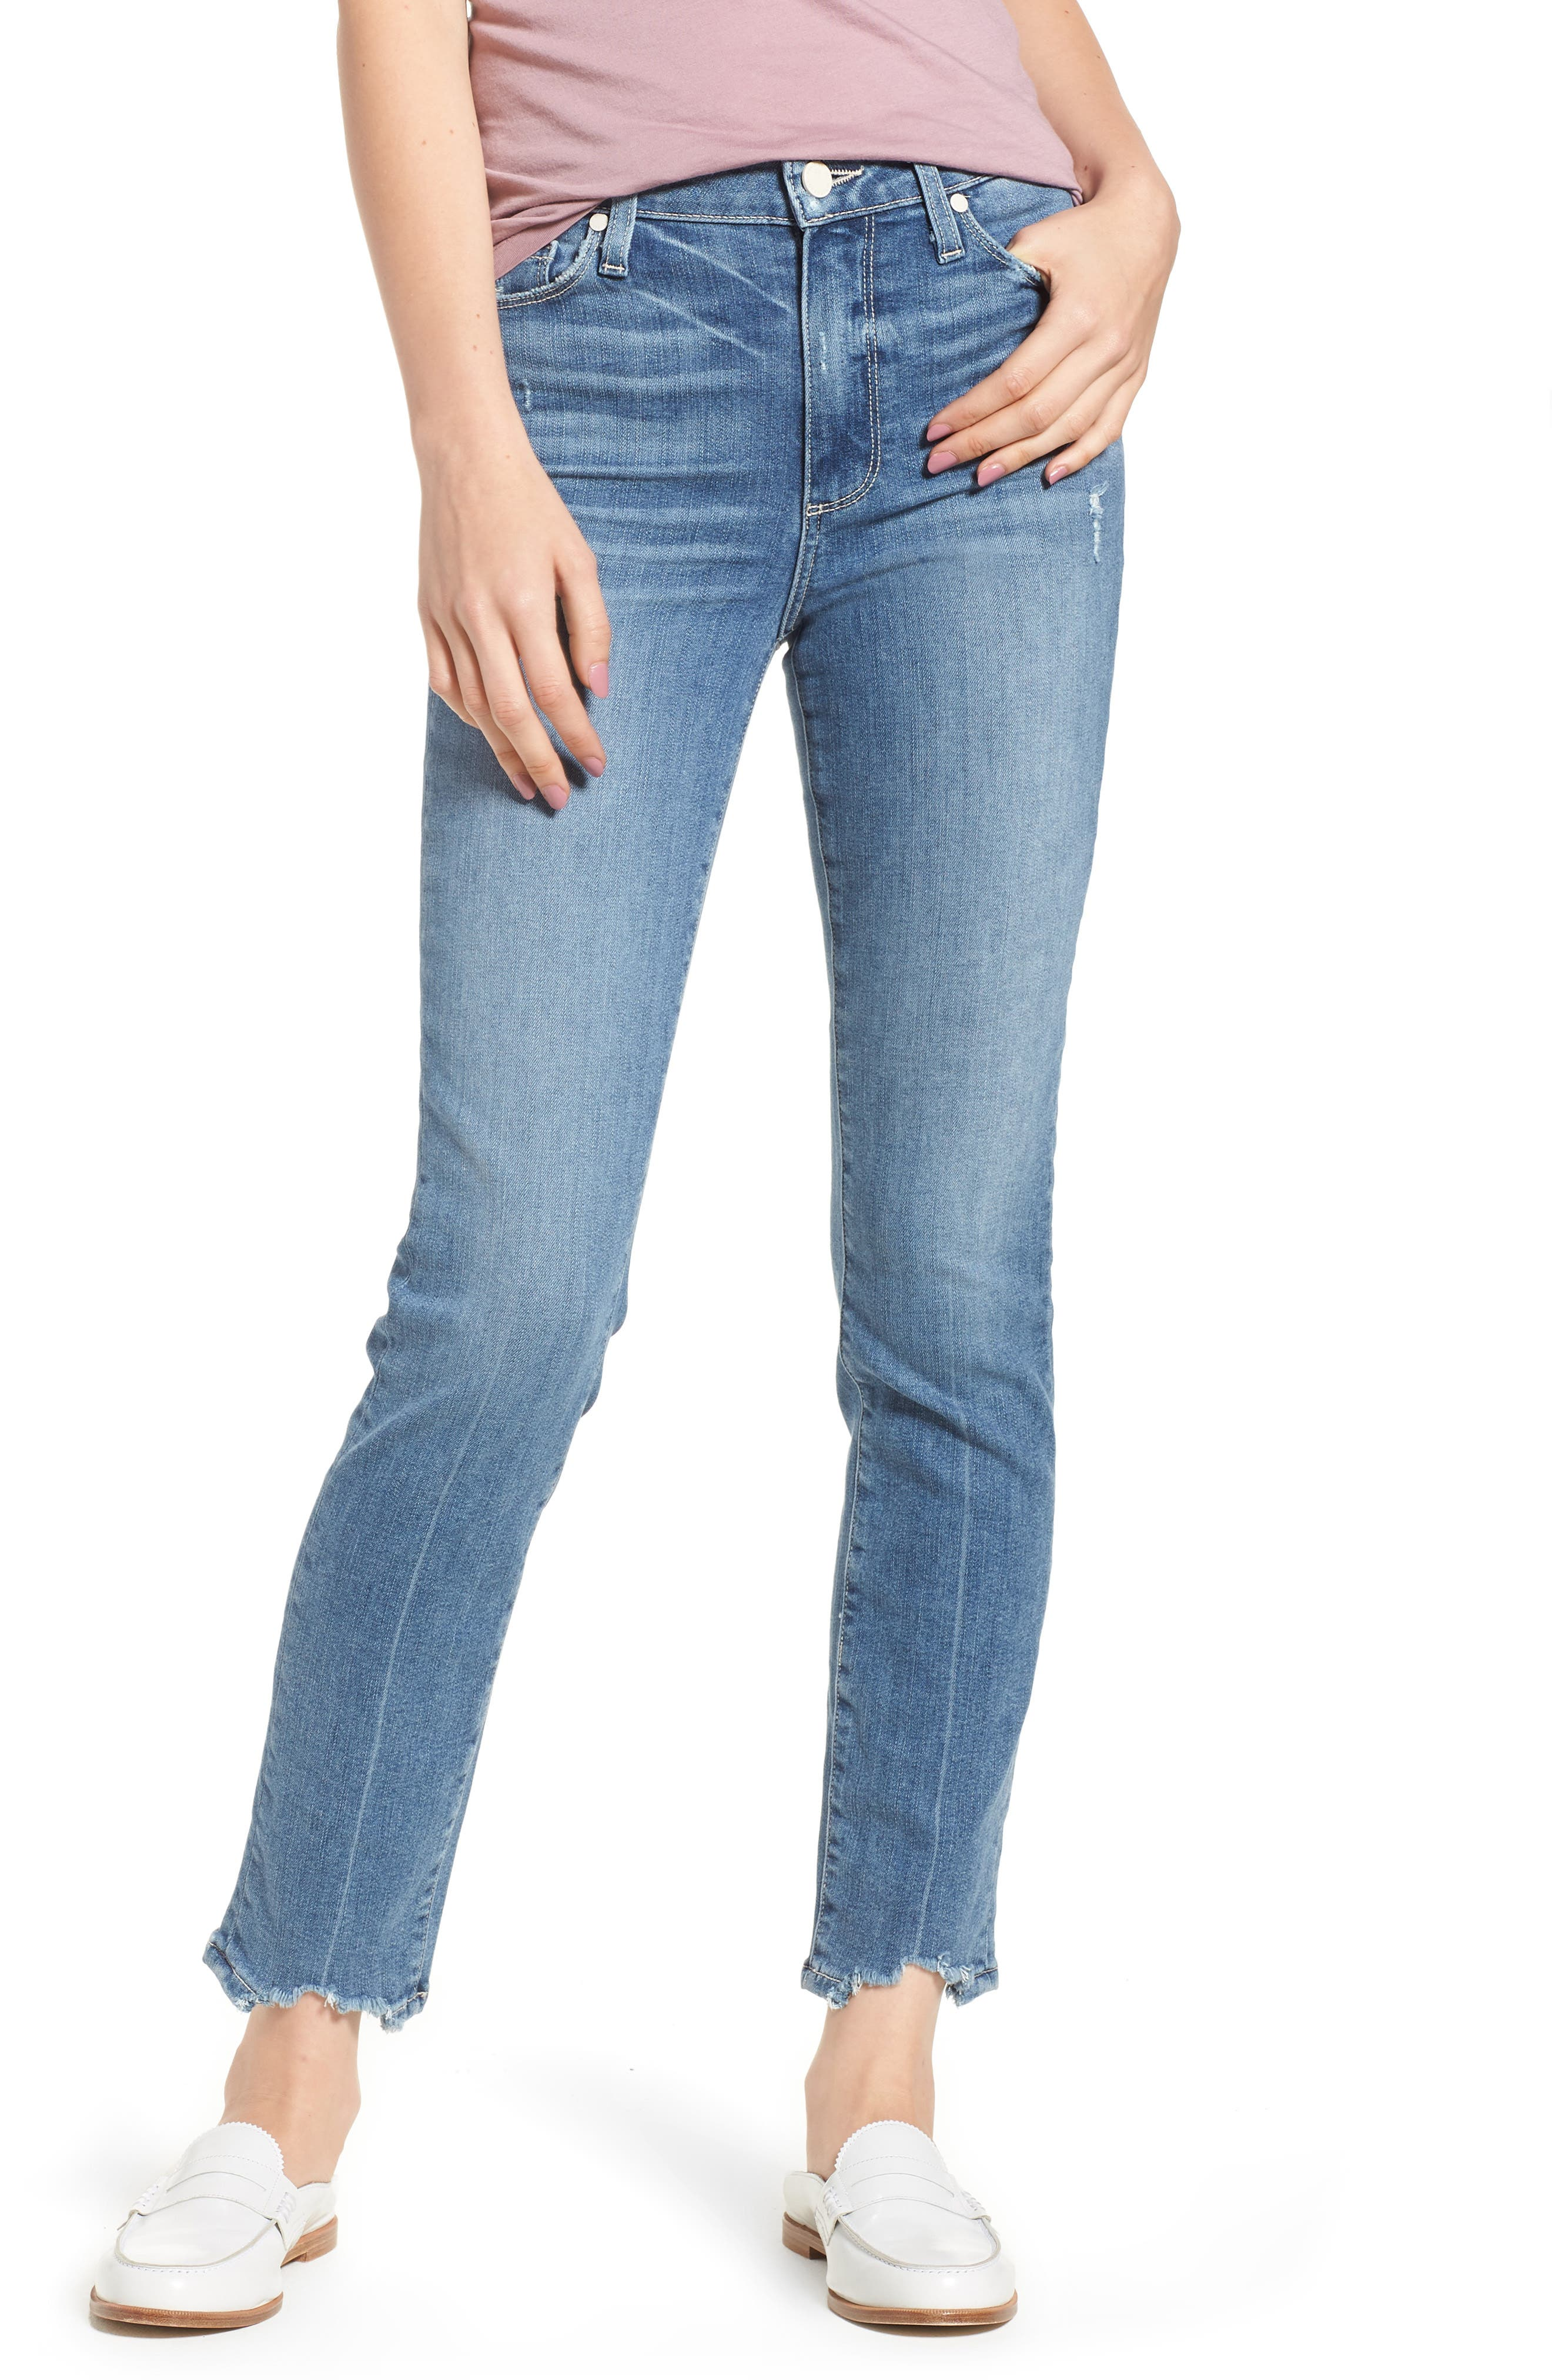 Transcend Vintage - Hoxton High Waist Ankle Skinny Jeans,                             Main thumbnail 1, color,                             ZAHARA